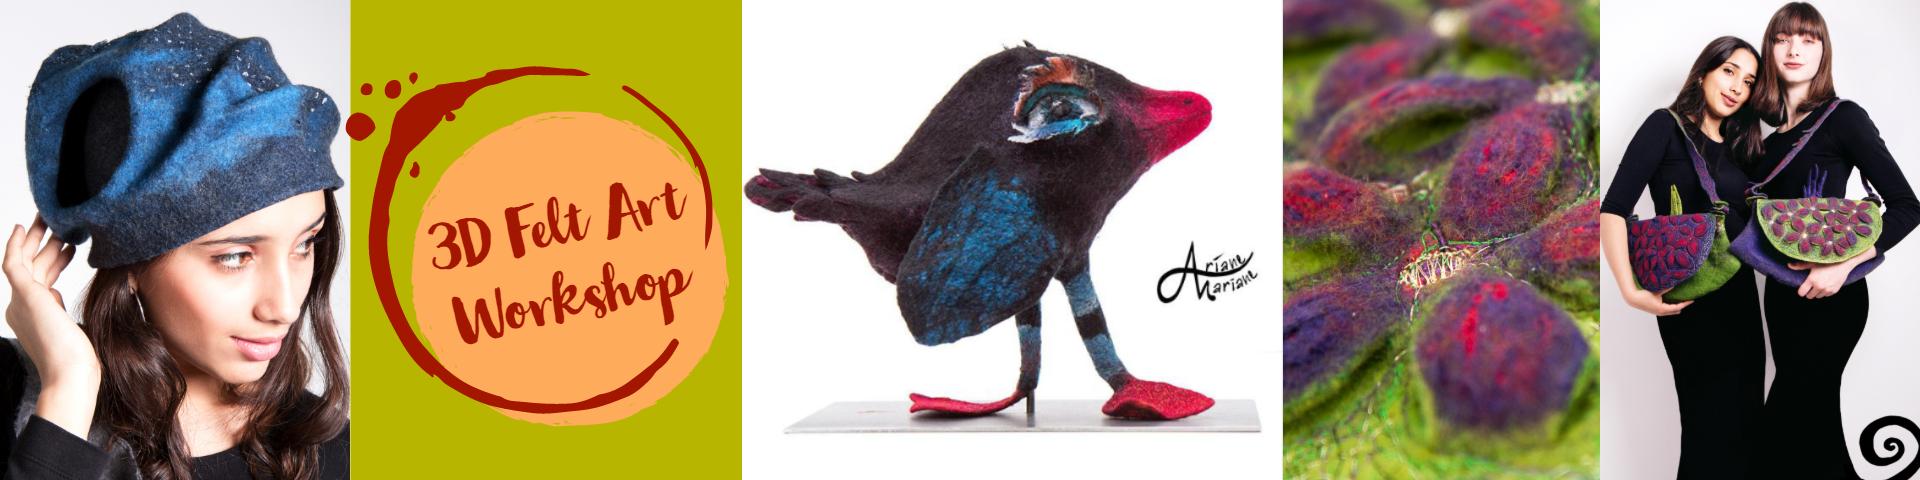 banner-3D-felt-art-workshop.jpg